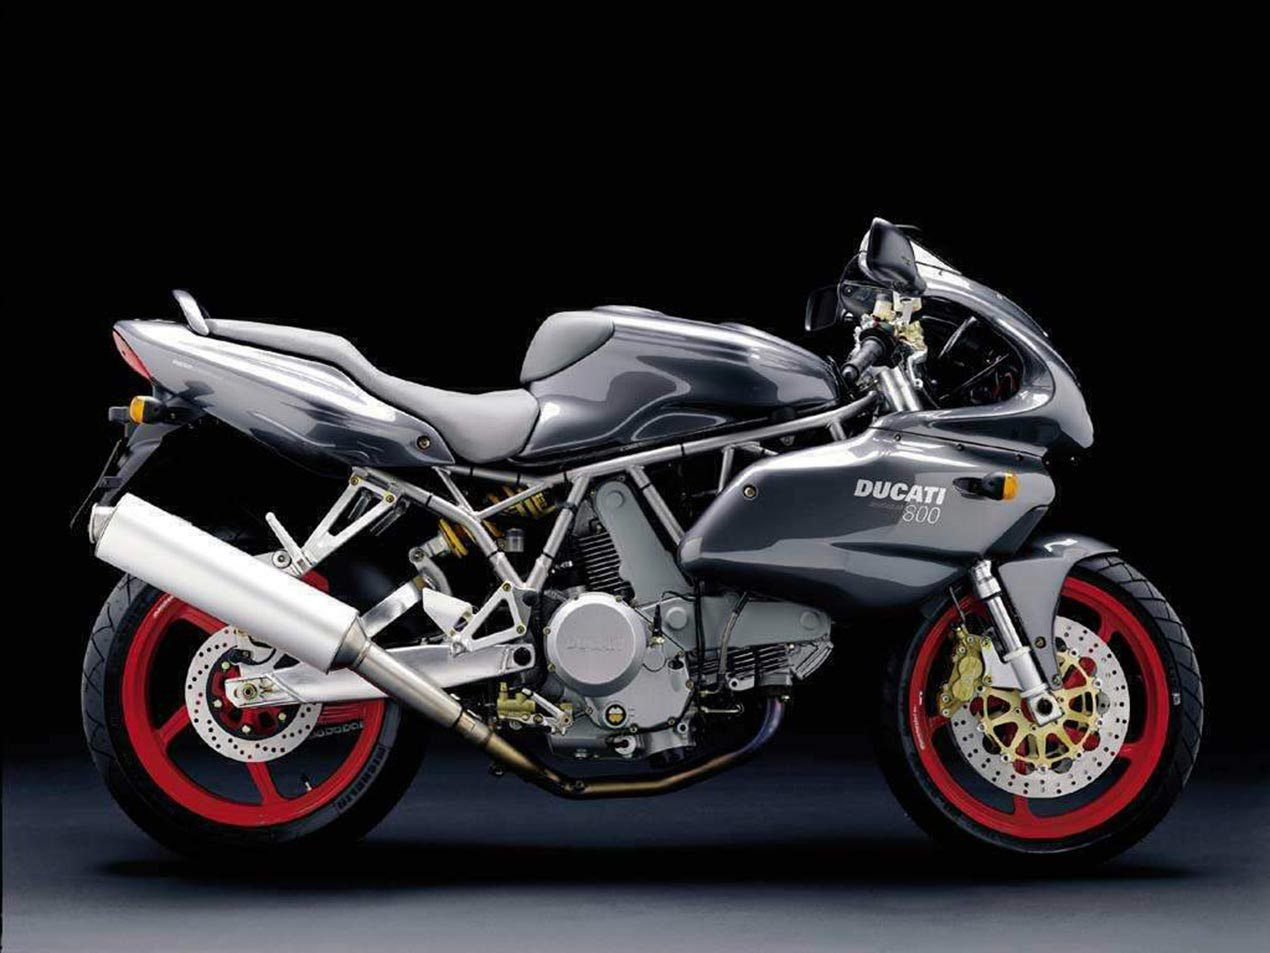 New Ducati Supersport For 2017 Ducati Supersport Ducati Ducati